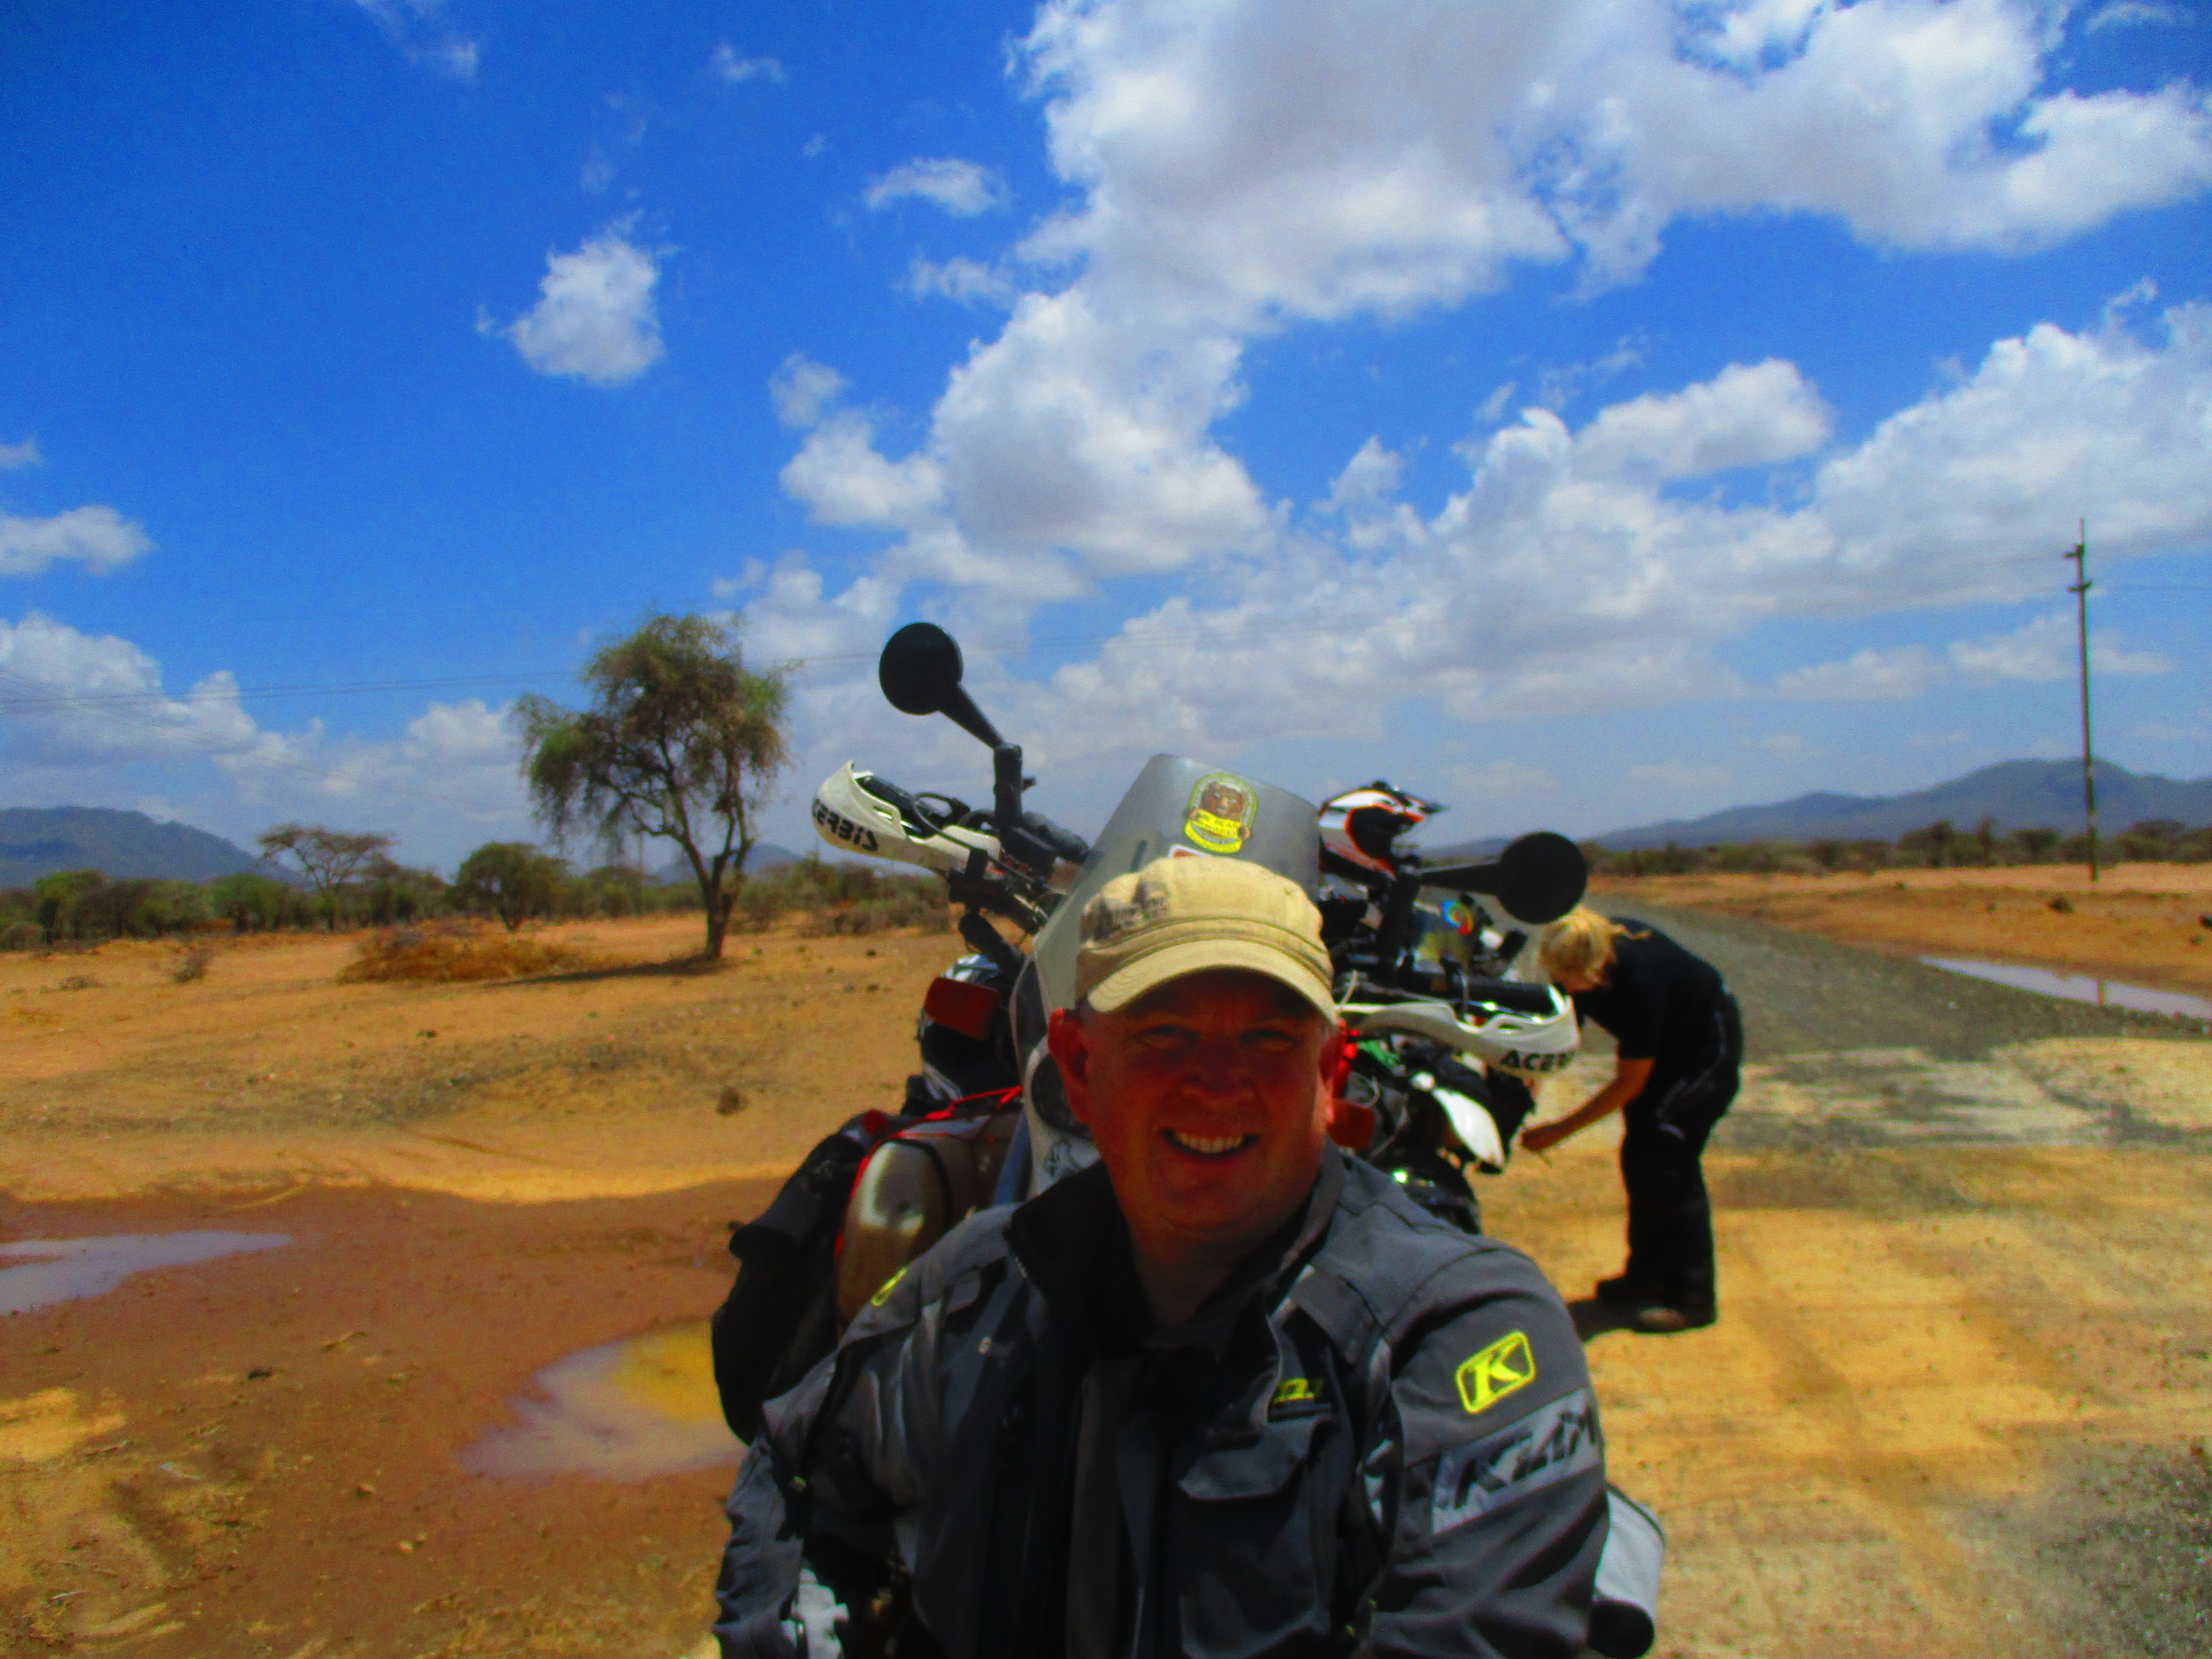 The landscape turned to striking desert on the run to the Kenyan border